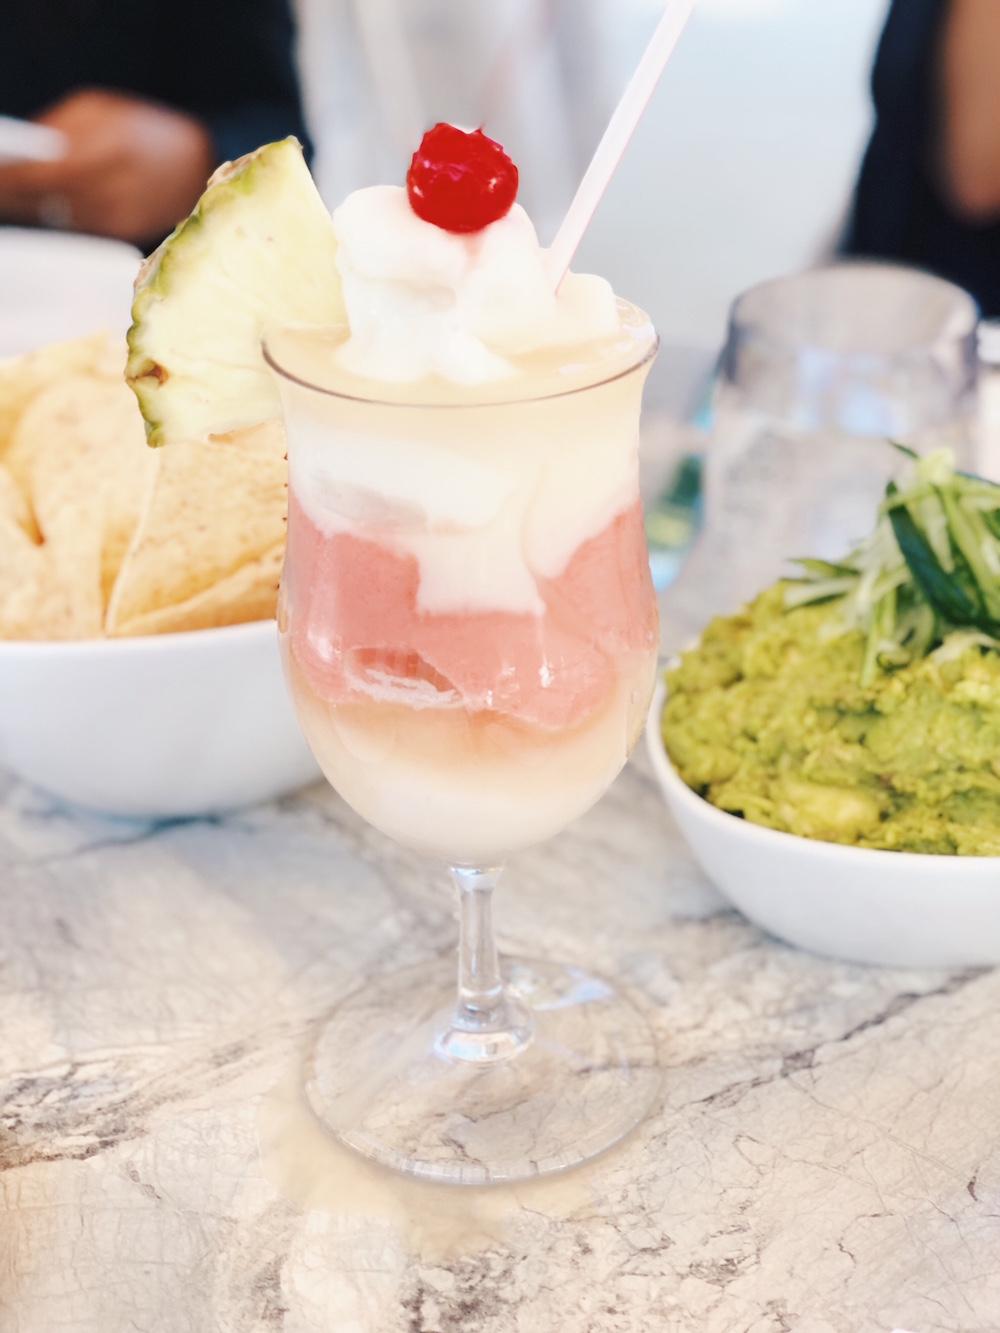 Miami vice frozen drink and chips guacamole at Palms Grand Hyatt Baha Mar Bahamas